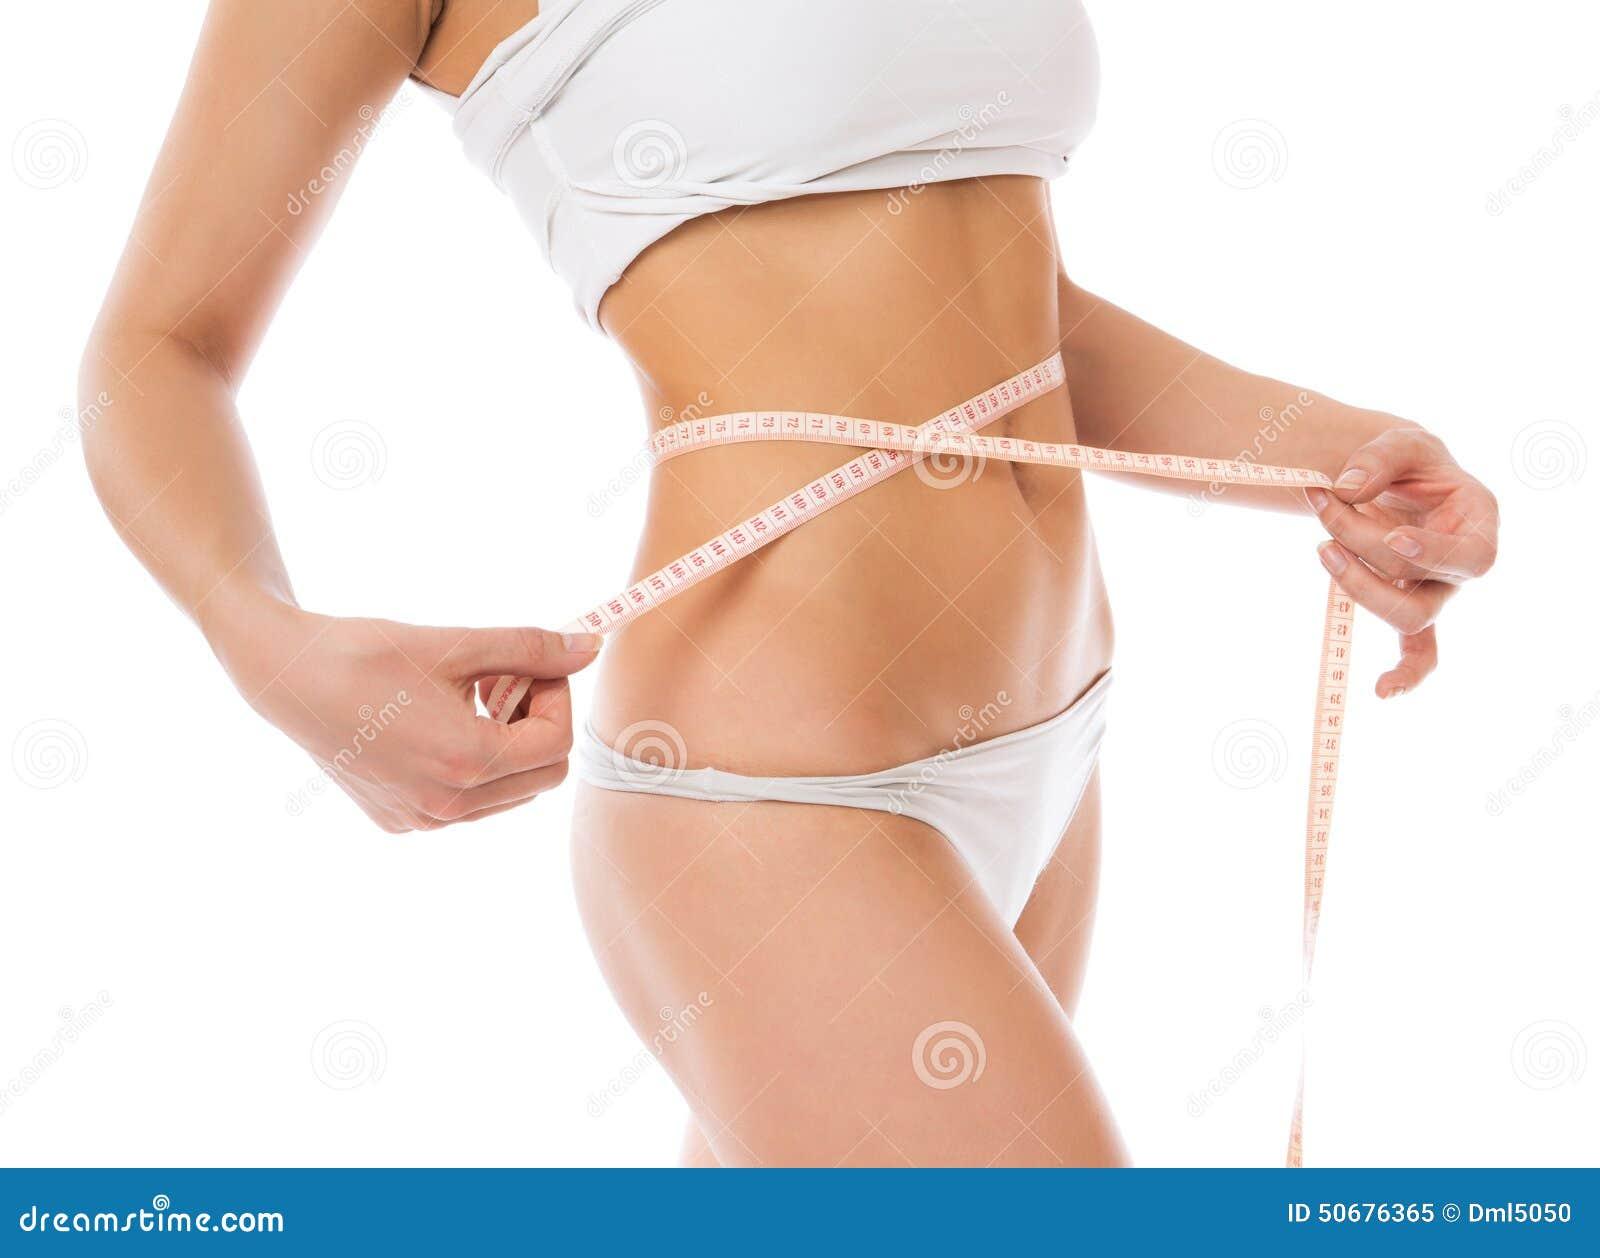 Download 评定亭亭玉立的磁带腰部妇女的评定 库存图片. 图片 包括有 正横, 关心, 饮食, 形状, 犰狳, 肥胖 - 50676365